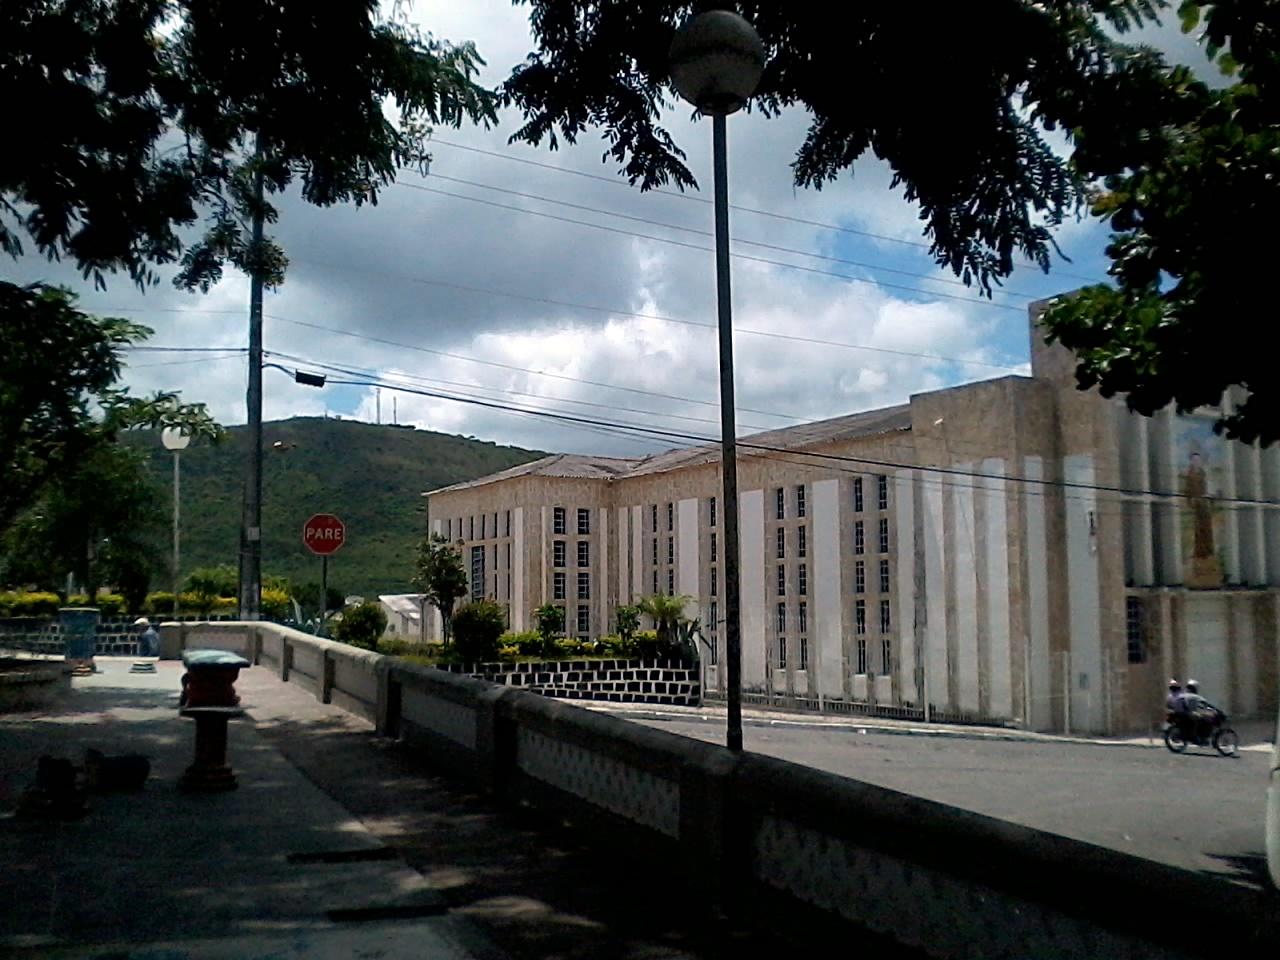 Campo Formoso Bahia fonte: upload.wikimedia.org